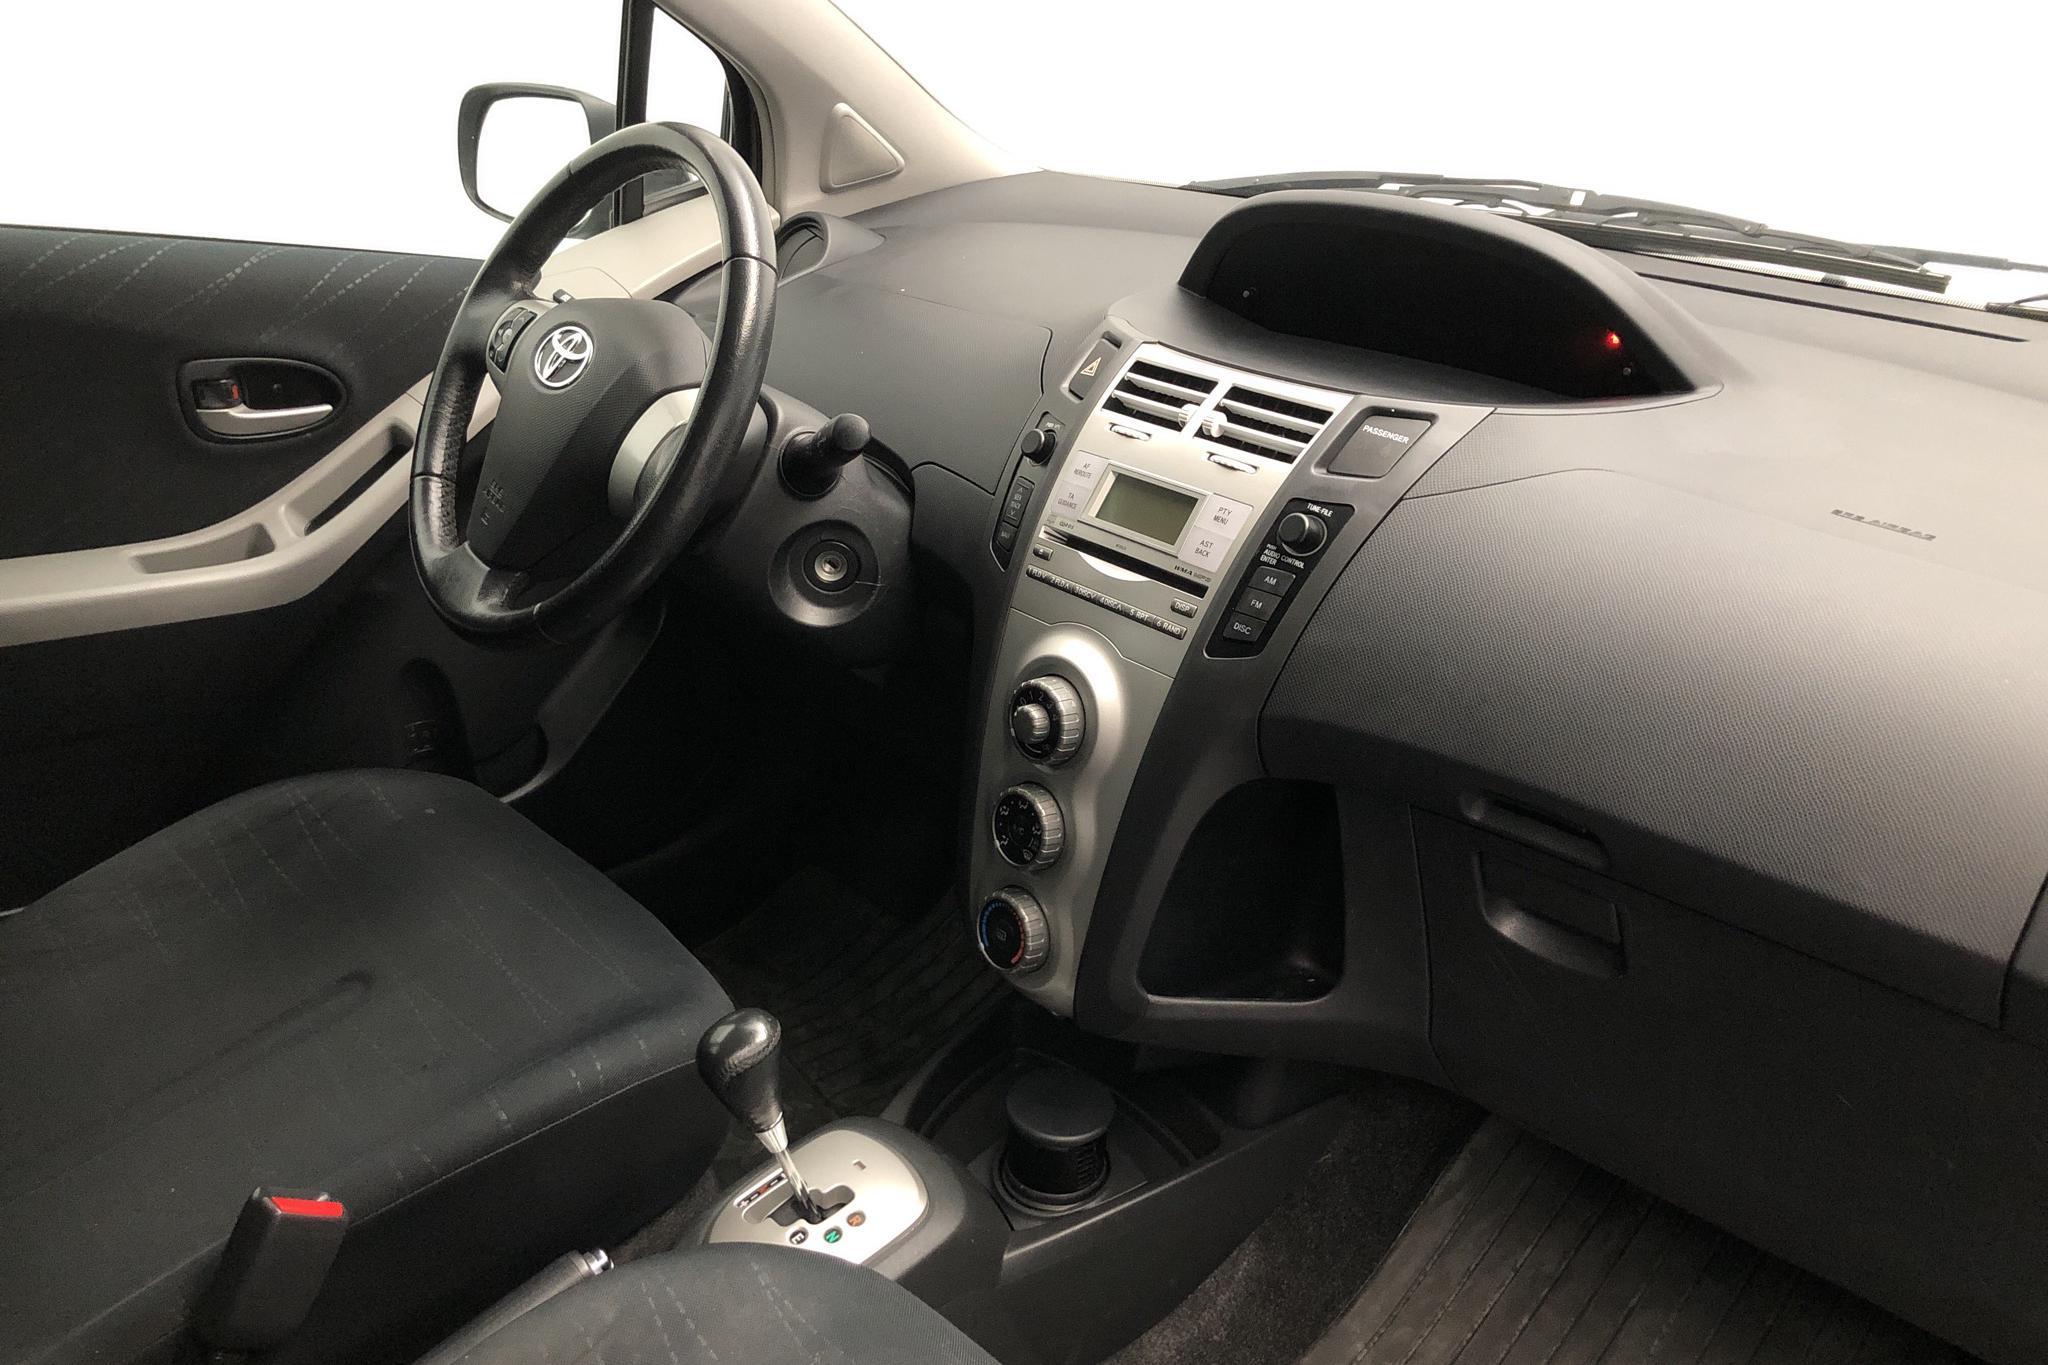 Toyota Yaris 1.3 5dr (87hk) - 9 075 mil - Automat - grå - 2008